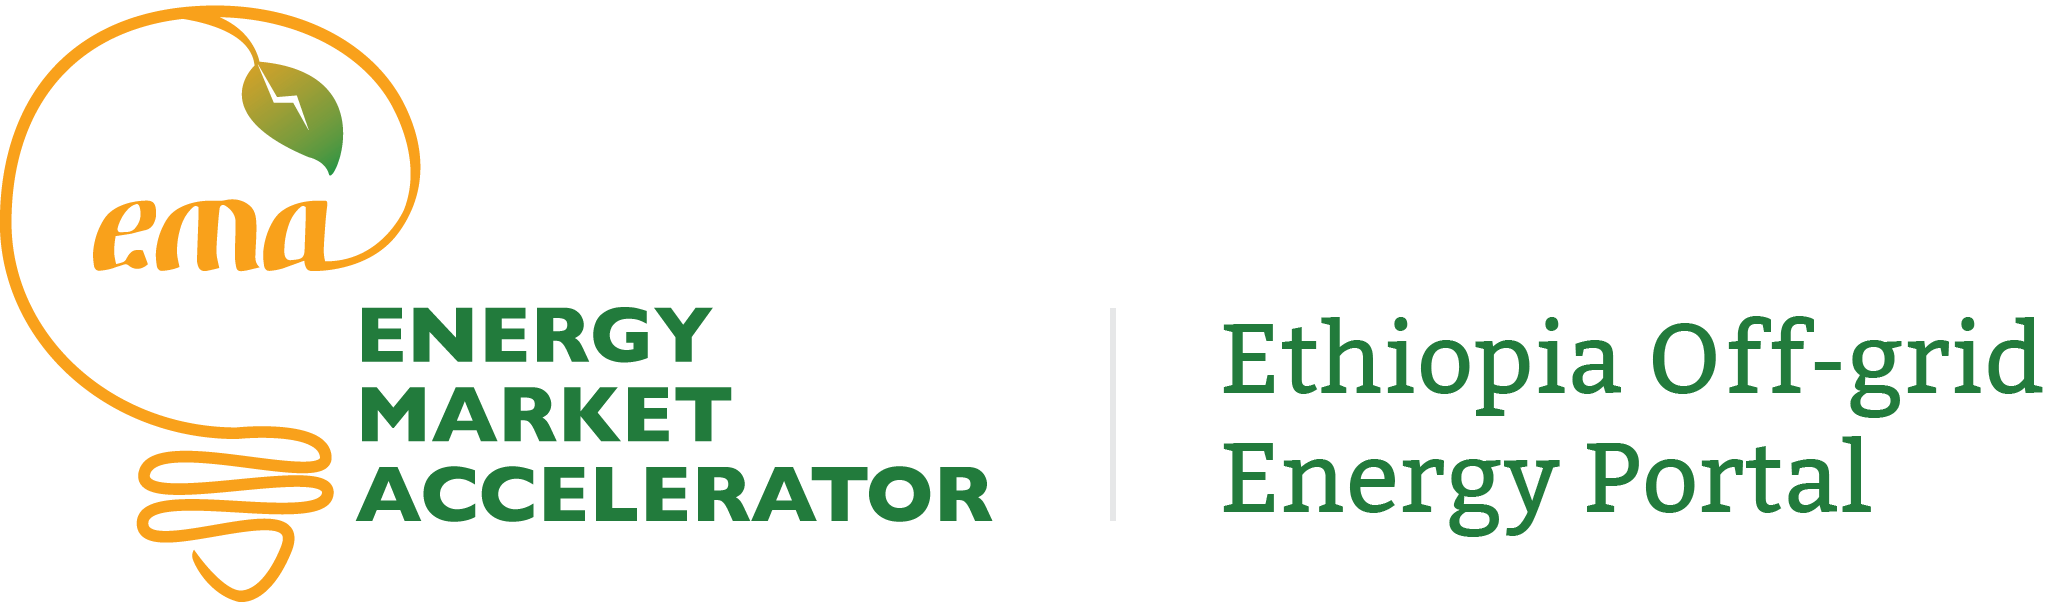 Energy Market Accelerator